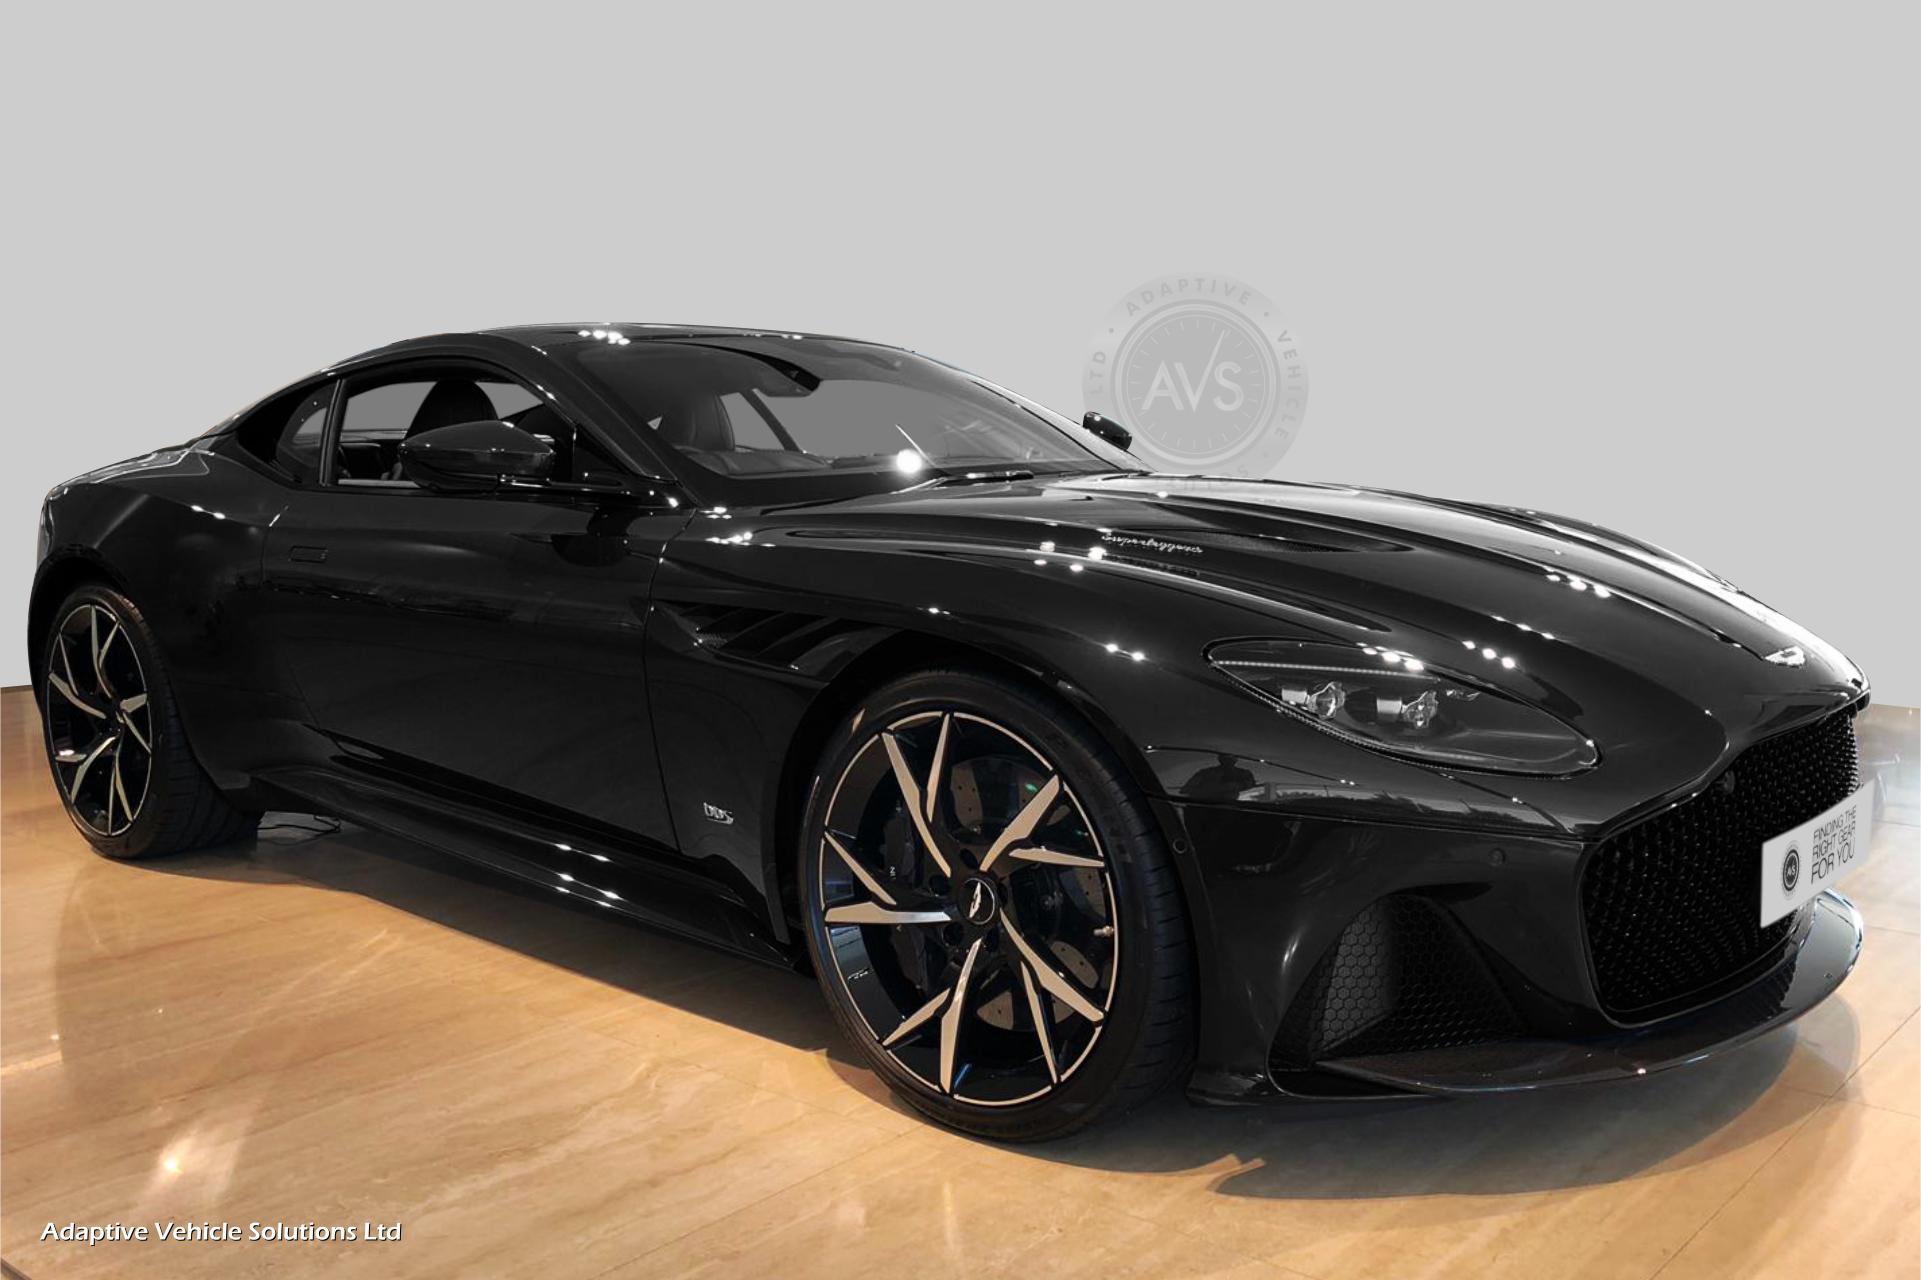 2019 Aston Martin DBS Superleggera Black 05